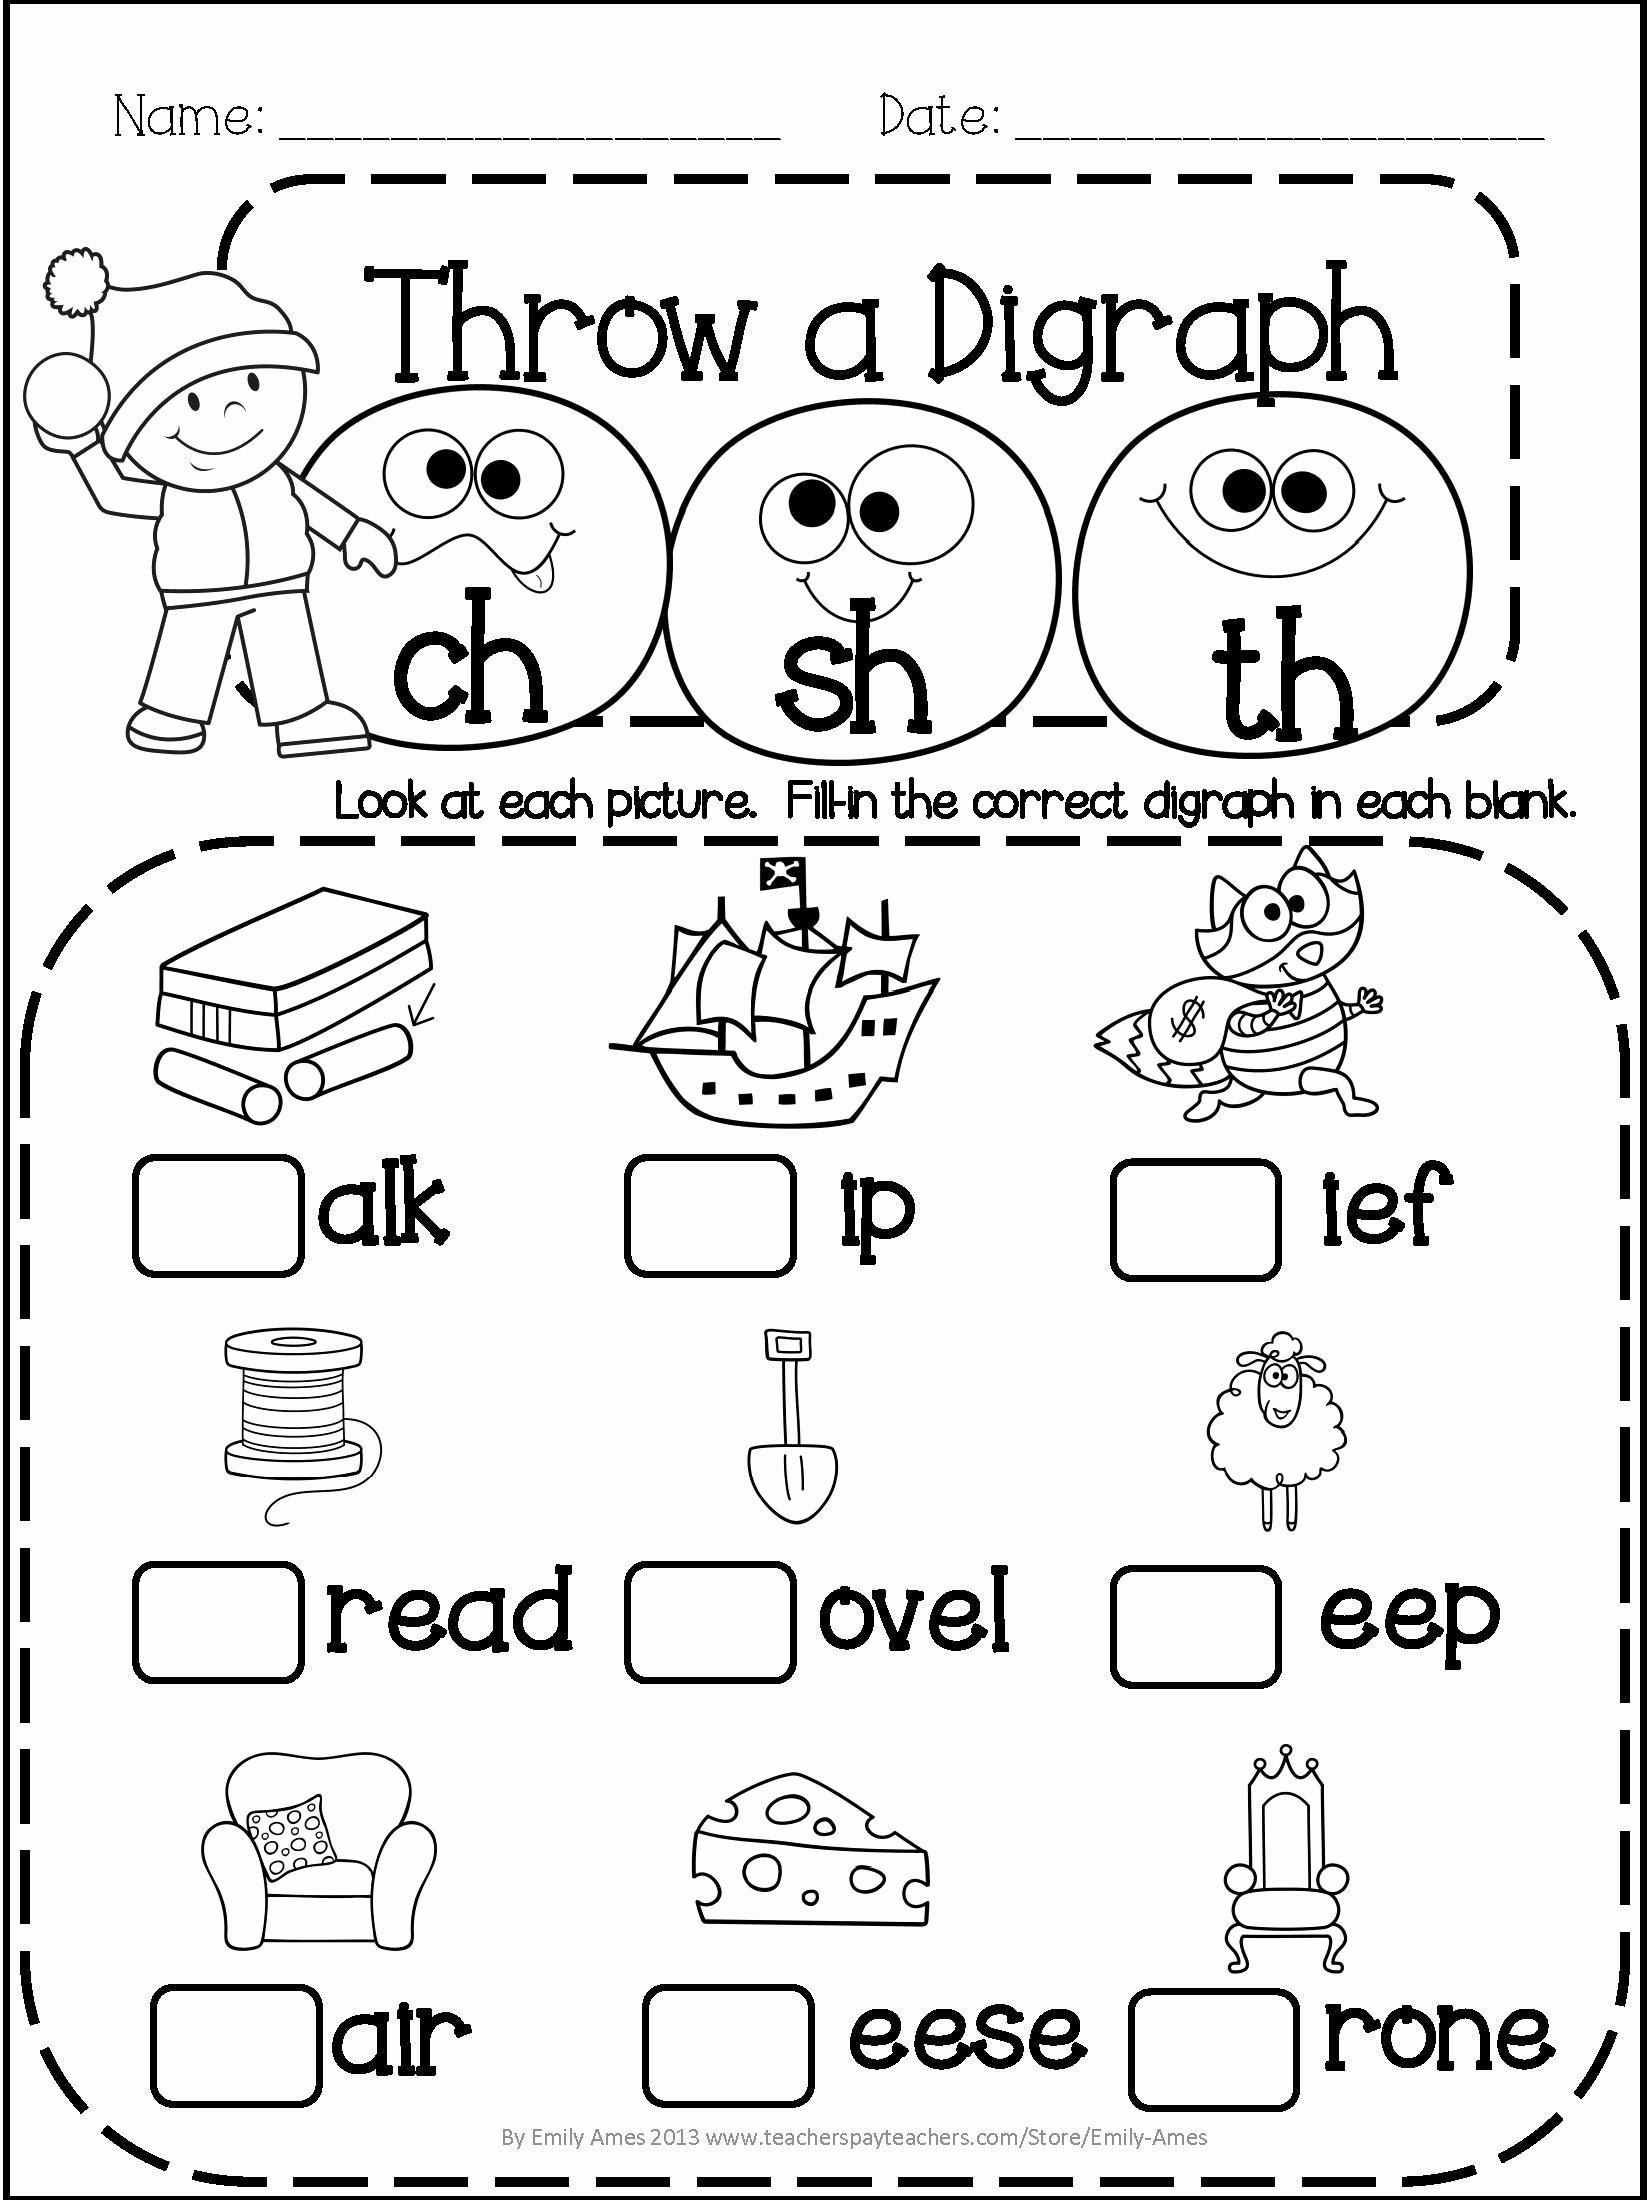 Blends Worksheet for First Grade Inspirational 20 Blends Worksheets for 1st Grade Dzofar Printable